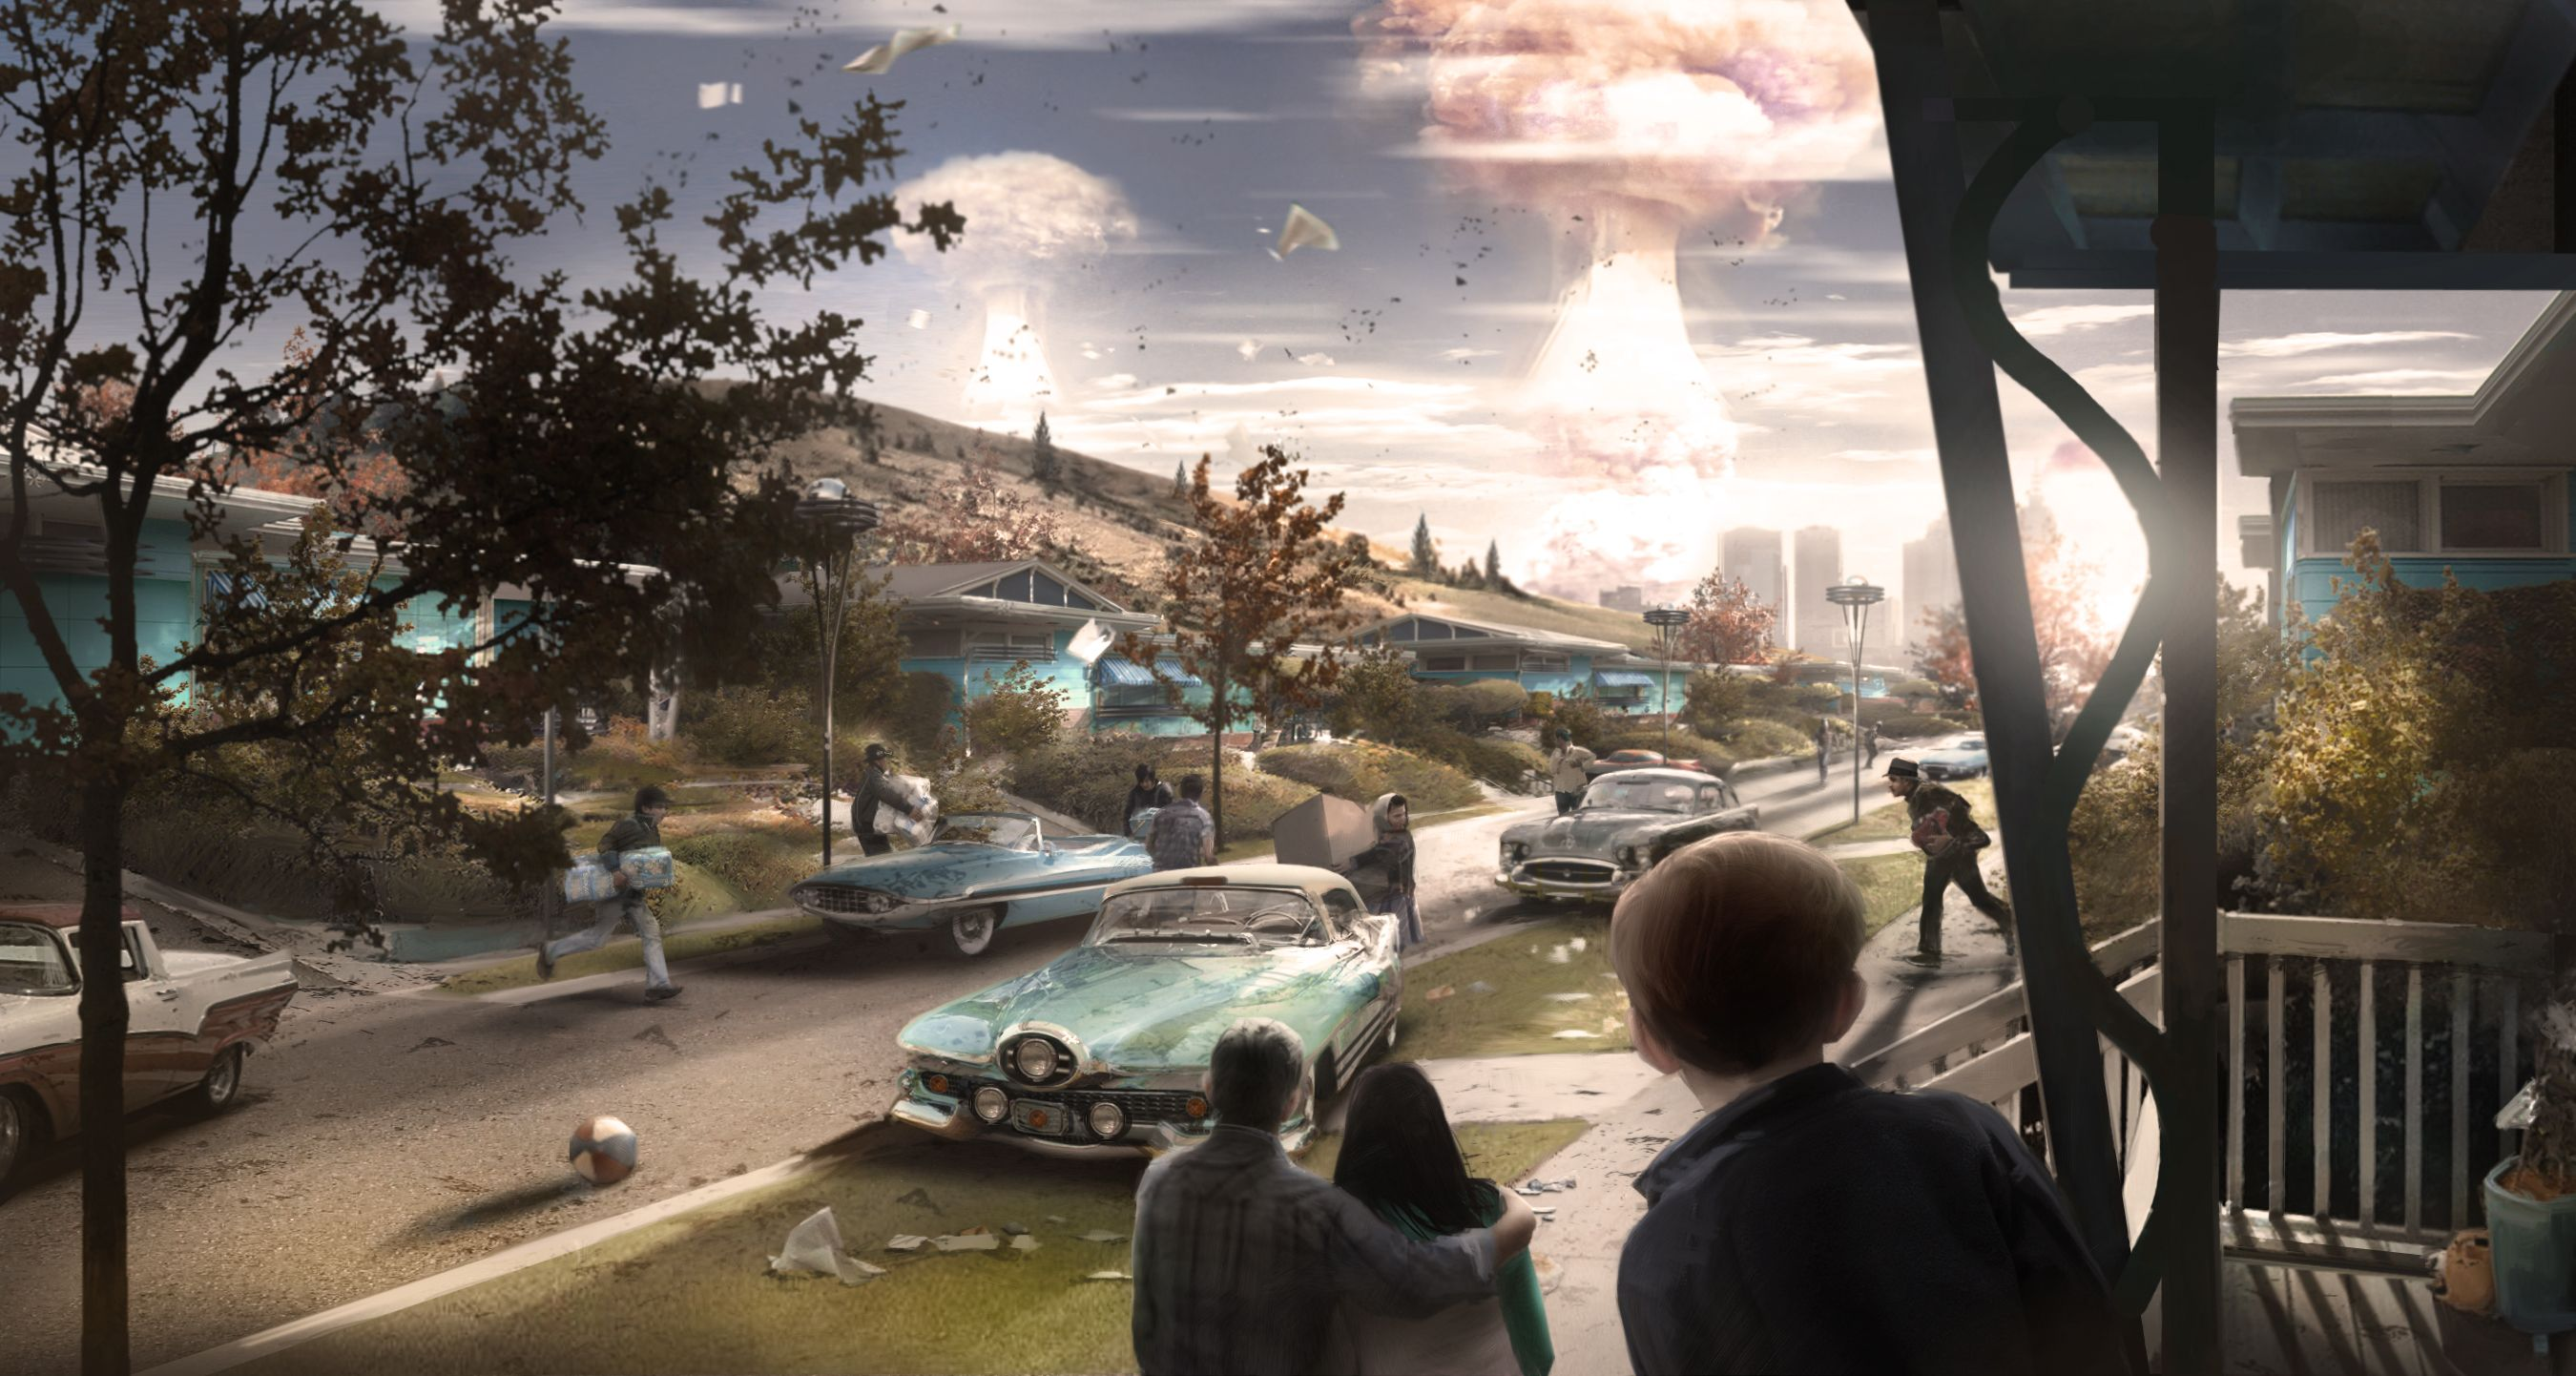 Fuentes de Informacin   Fallout 4 13 Wallpapers 2700x1442